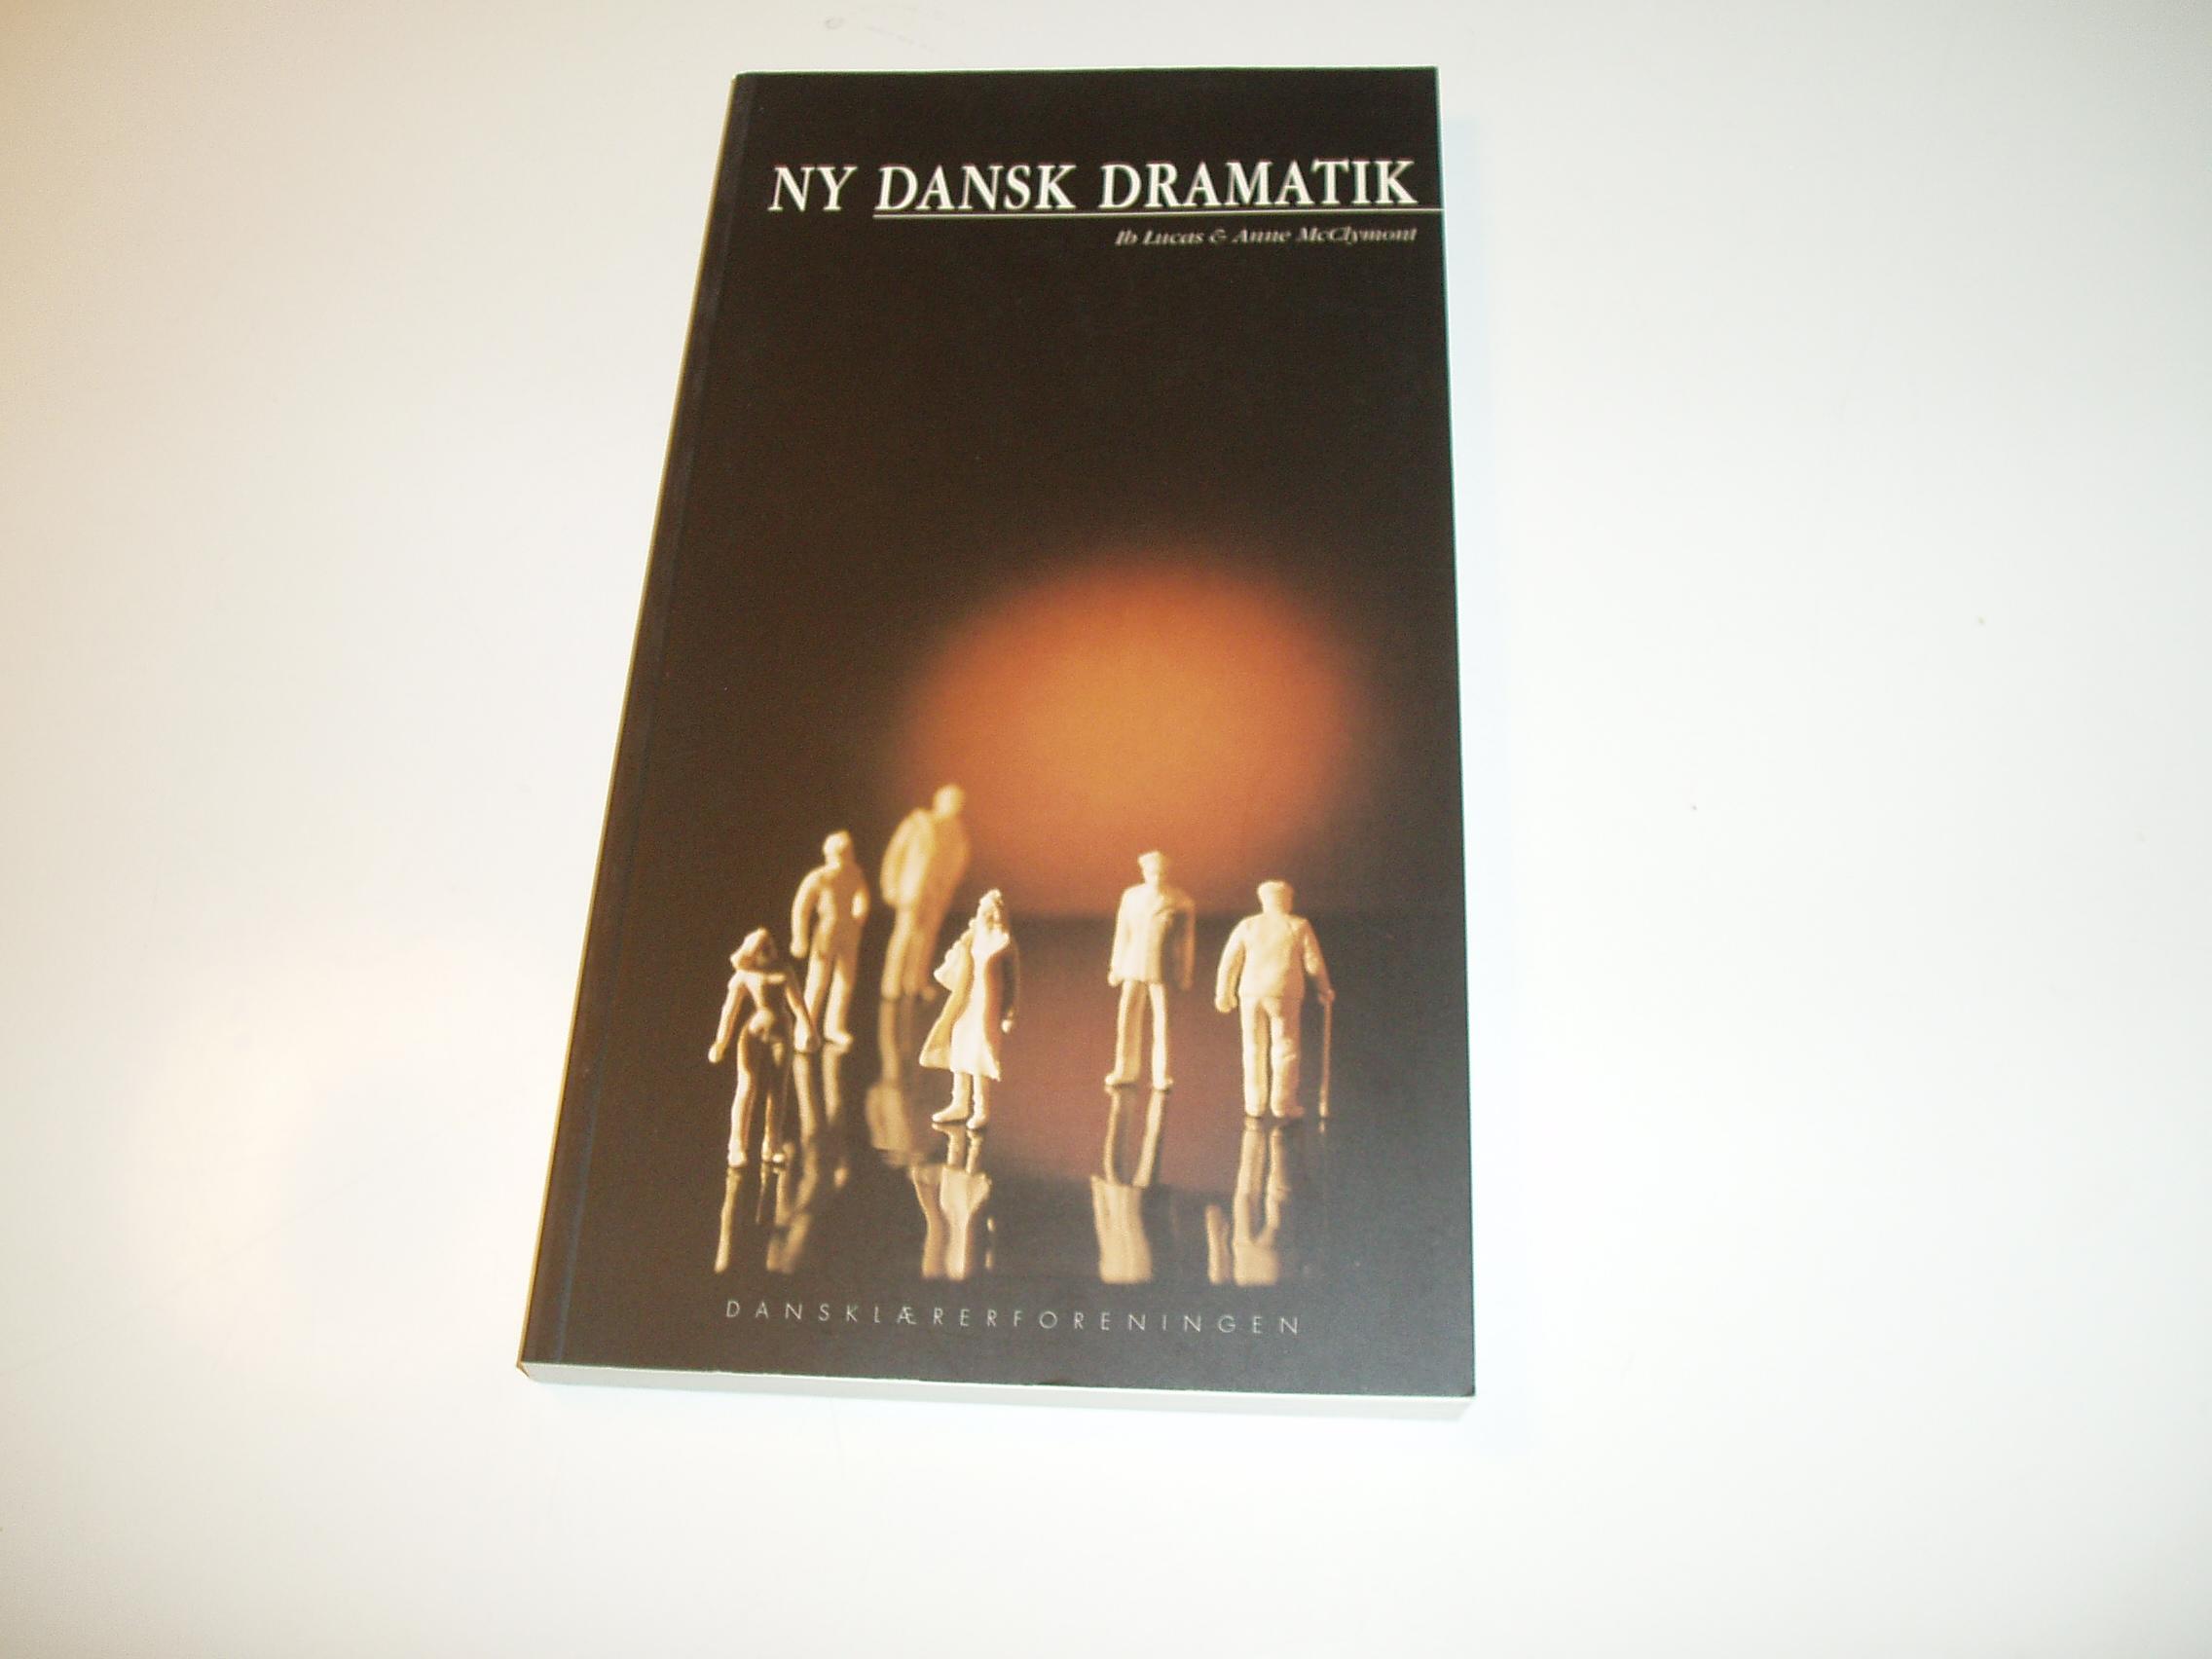 Ny dansk dramatik